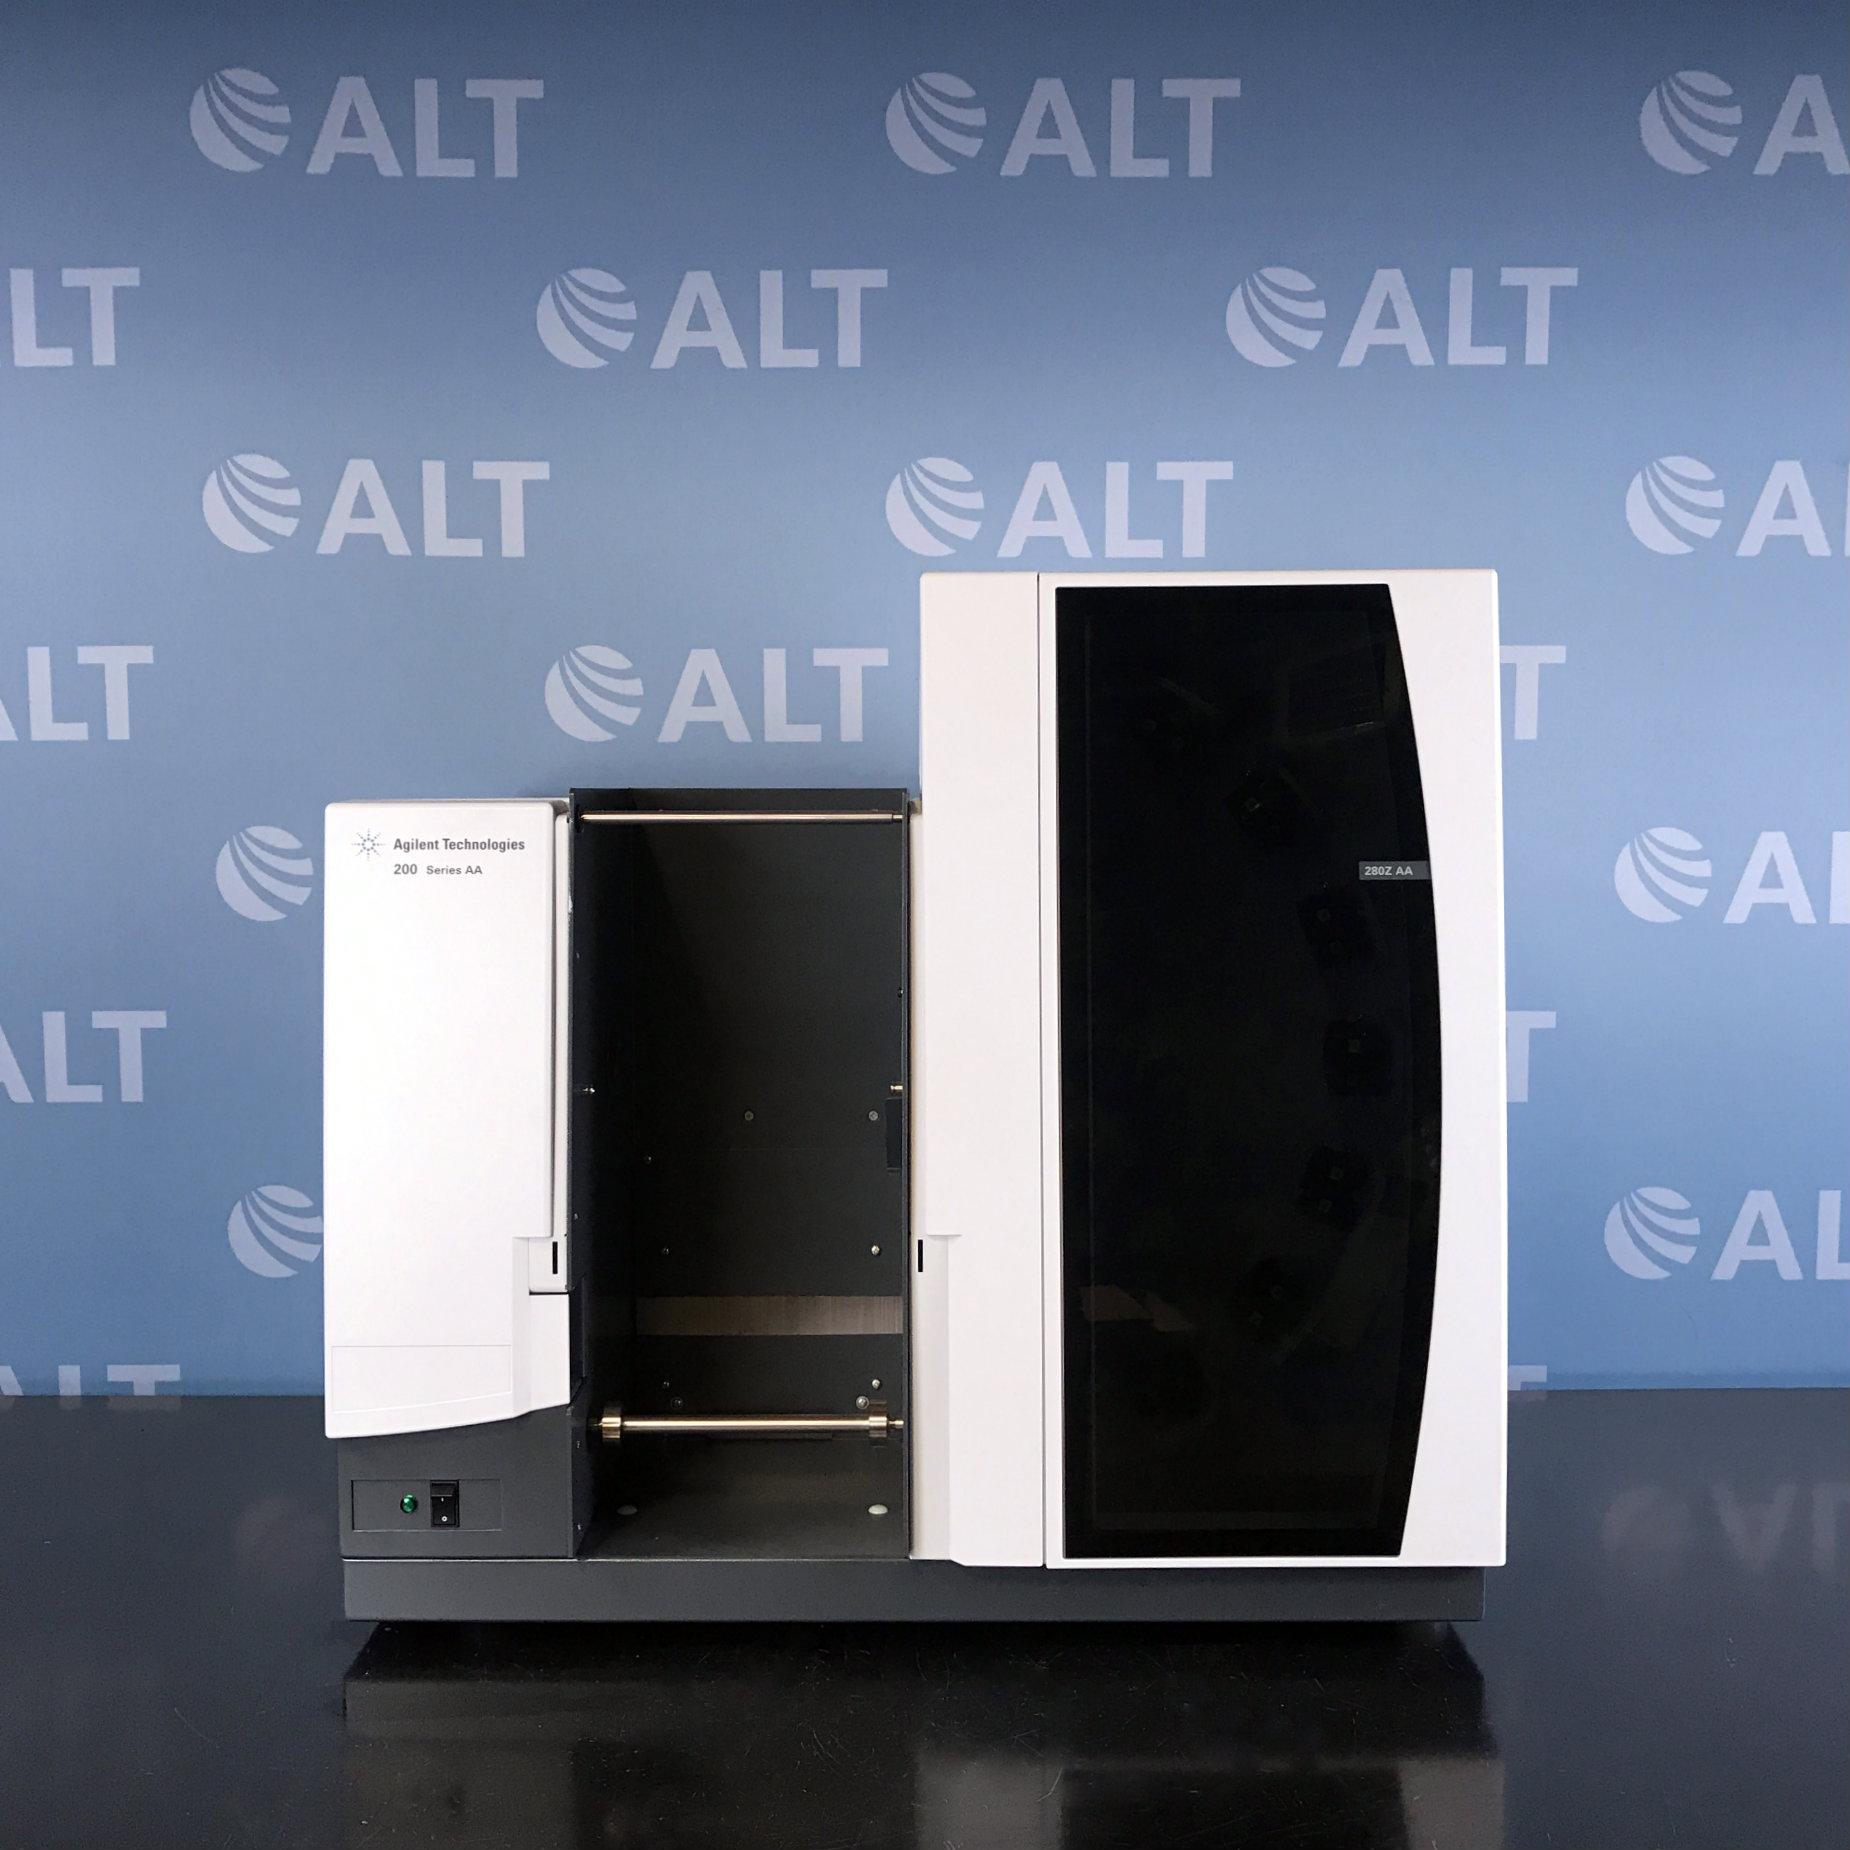 Refurbished Agilent Technologies 280z Aa Spectrometer